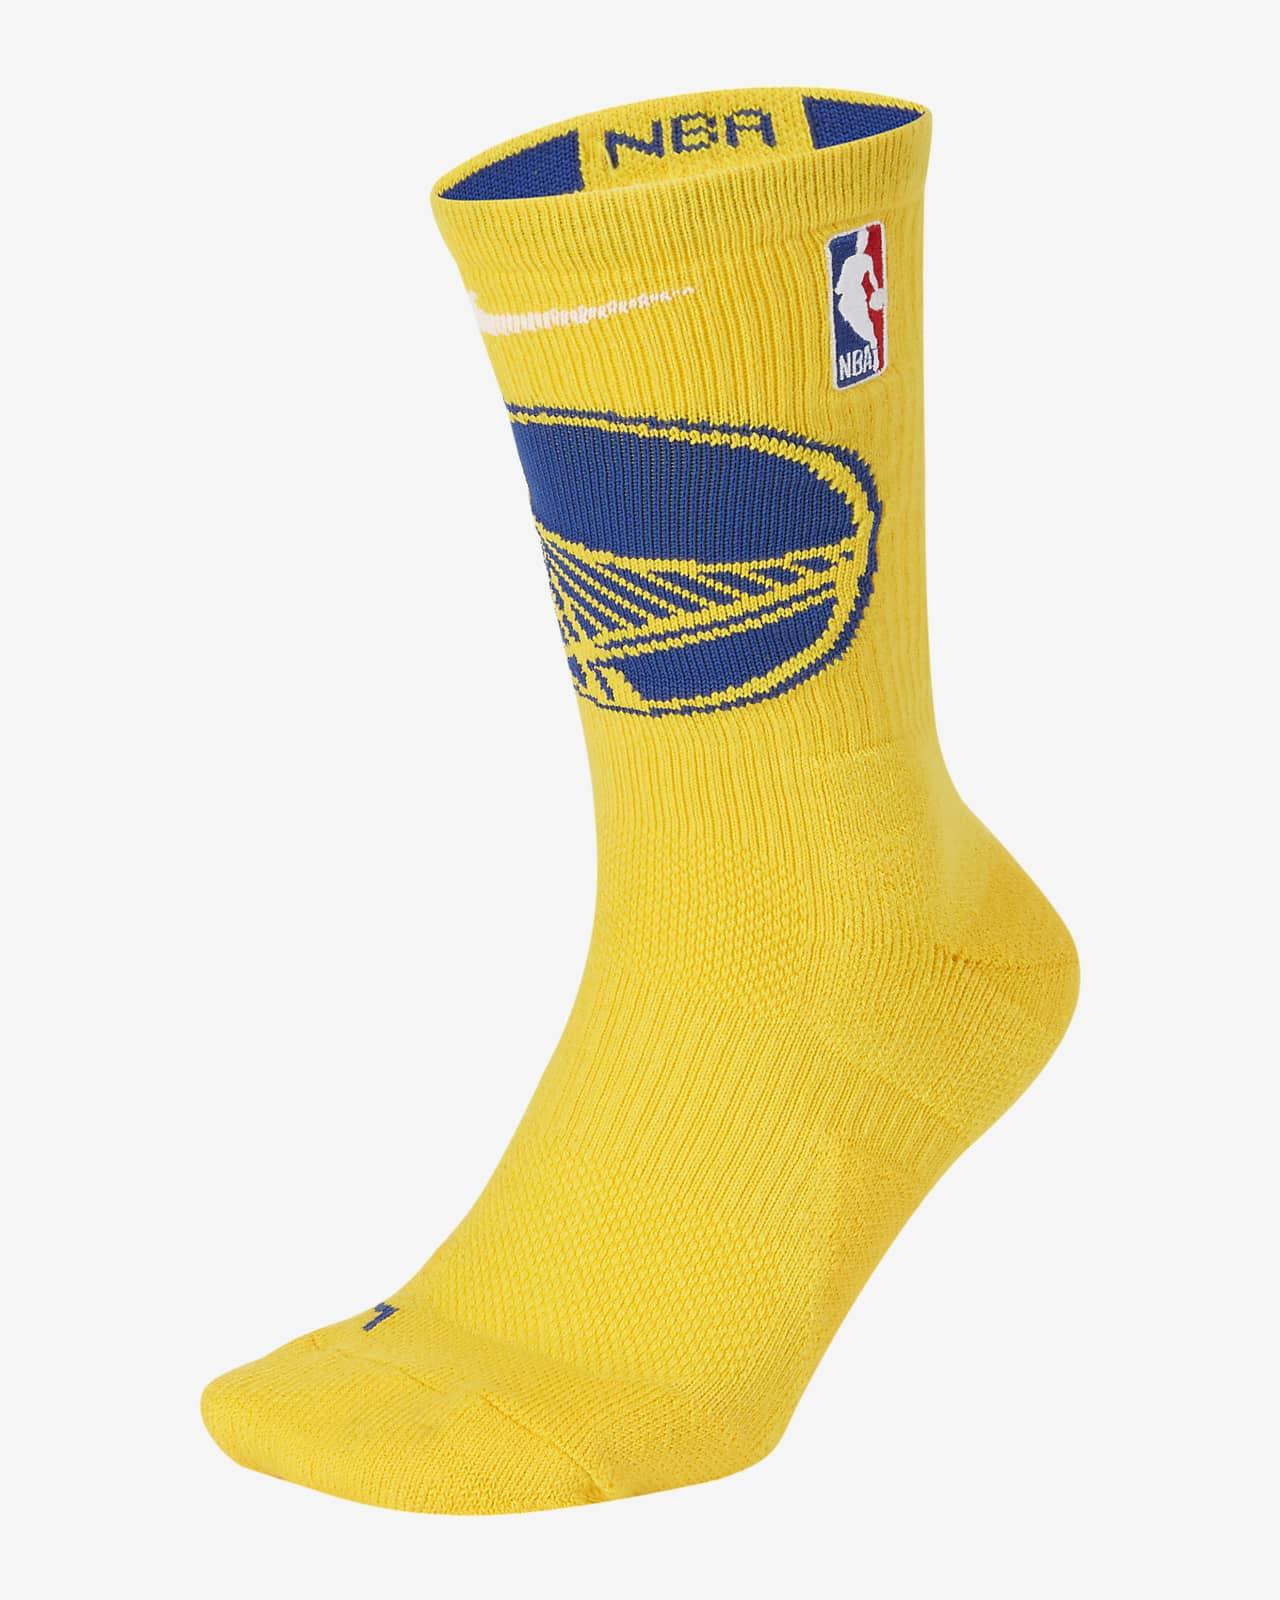 Golden State Warriors Nike Elite NBA Crew Socks